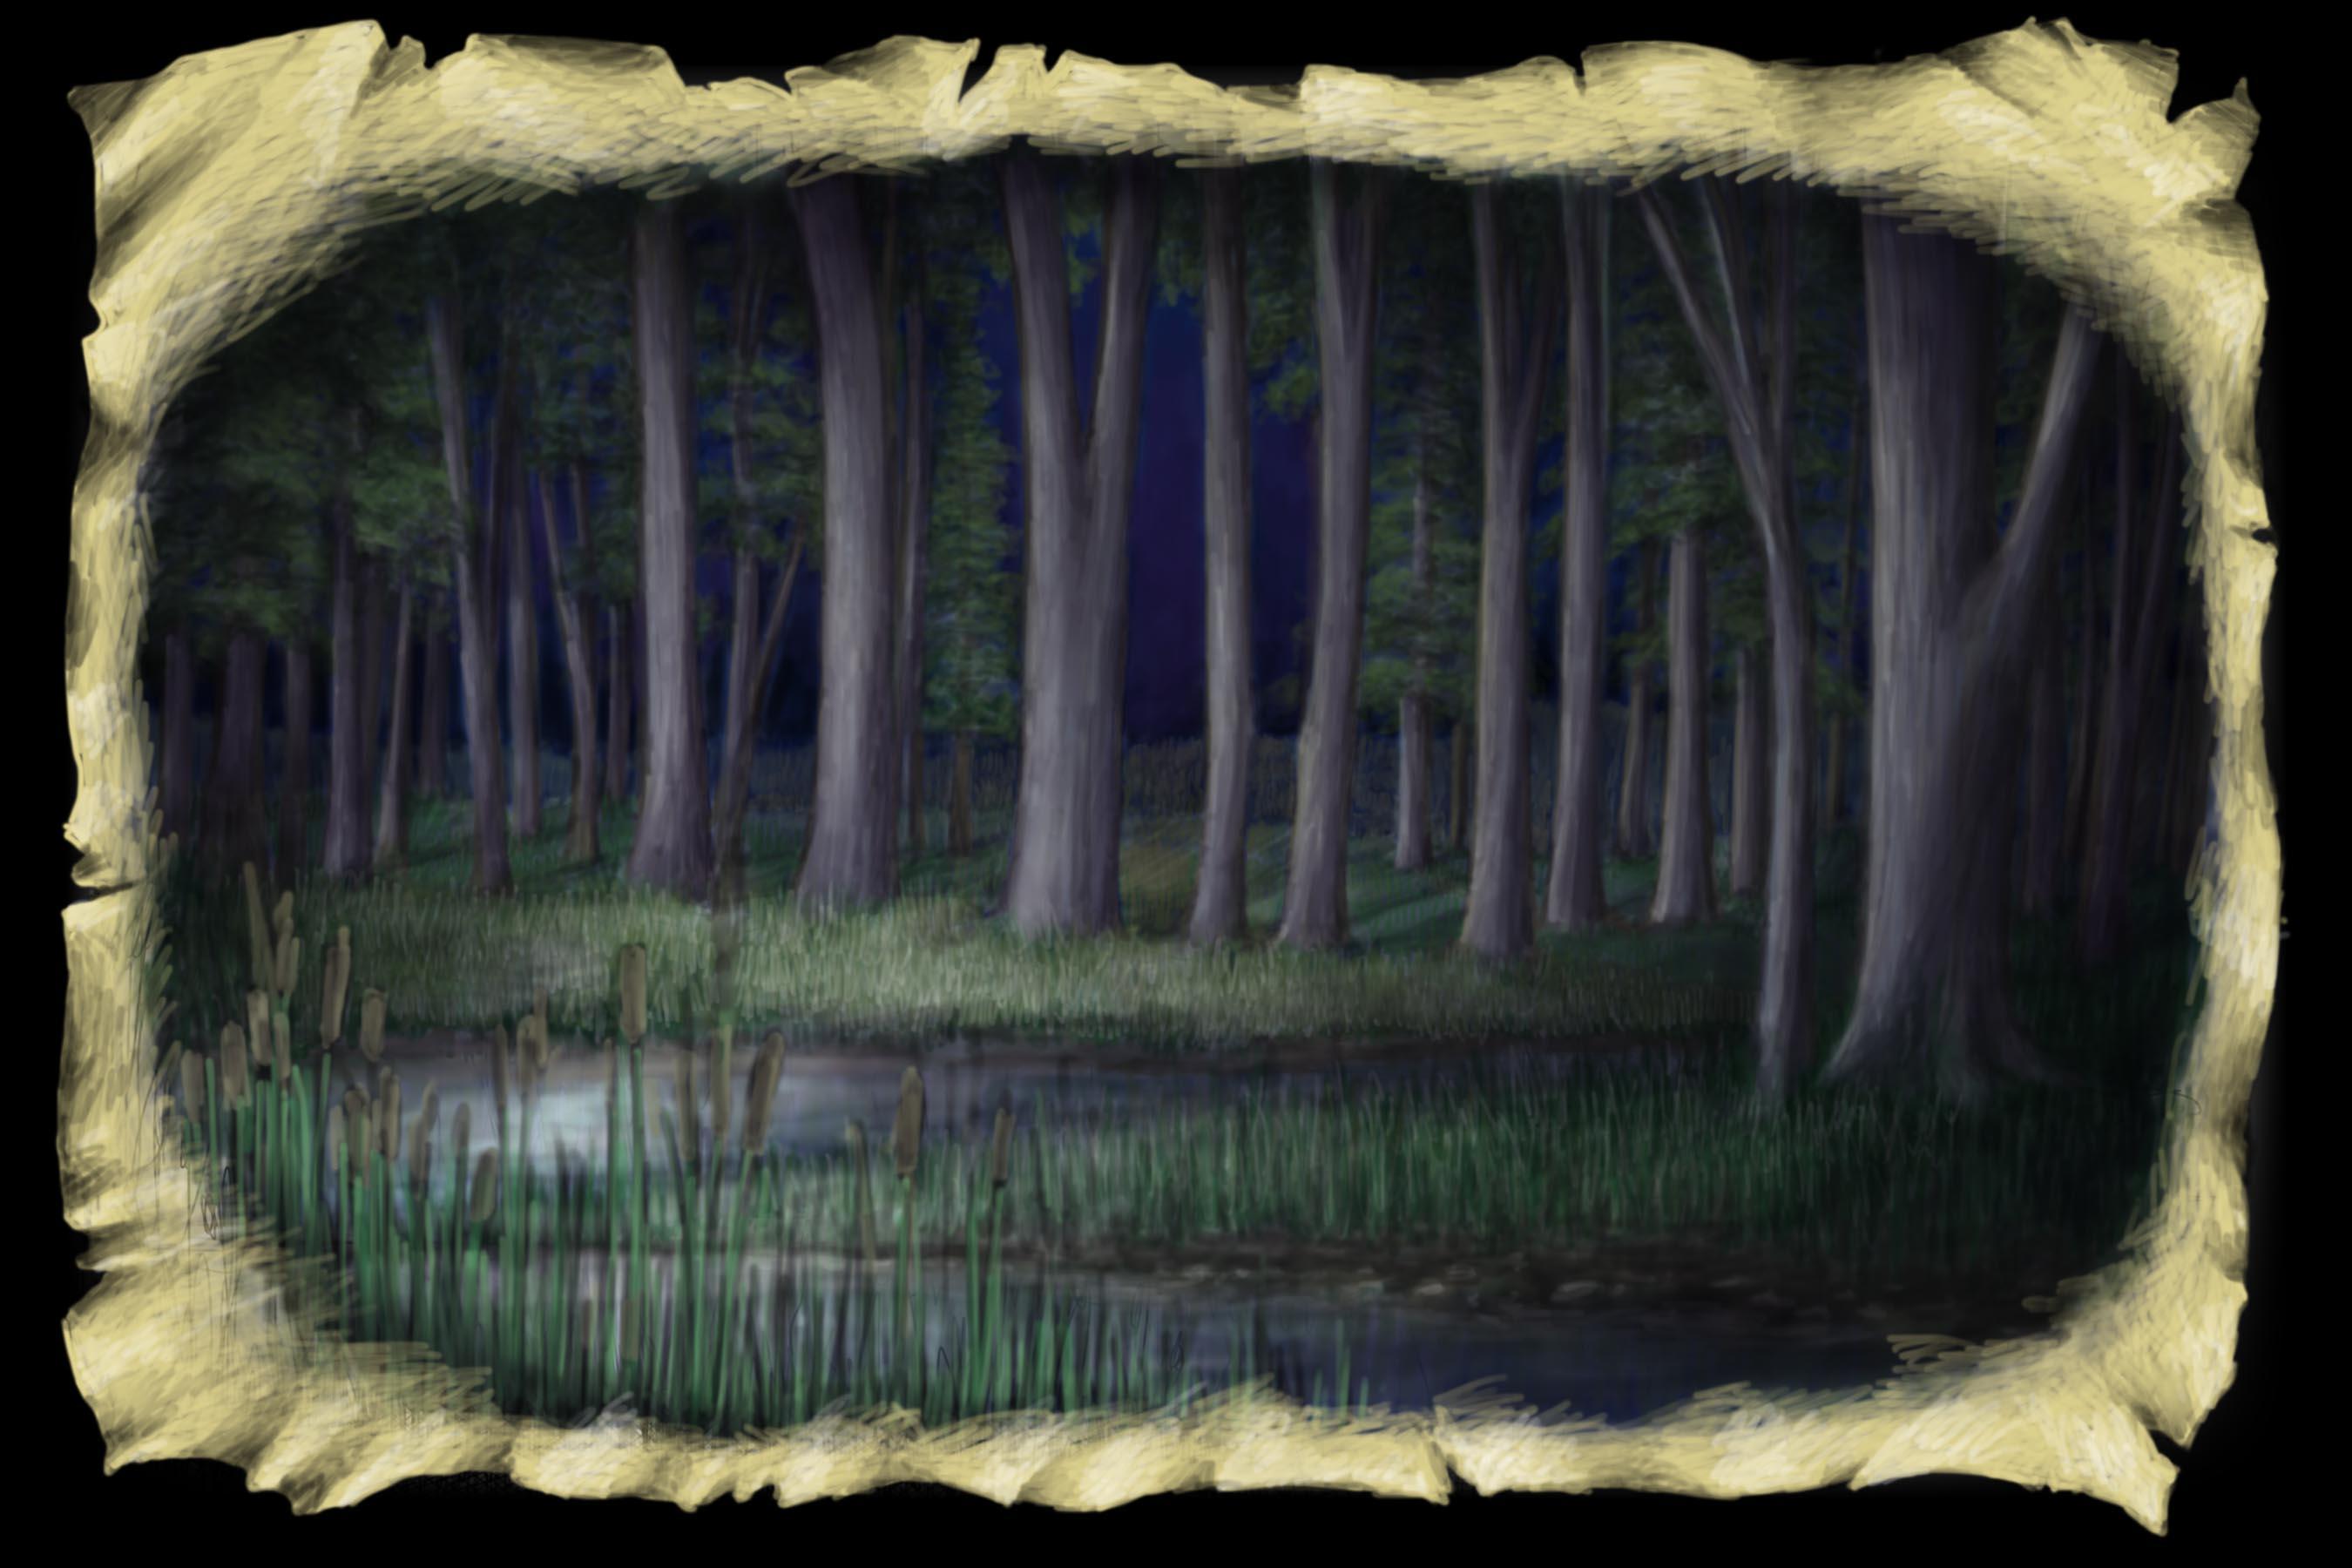 Scene 5. Lake, Nighttime